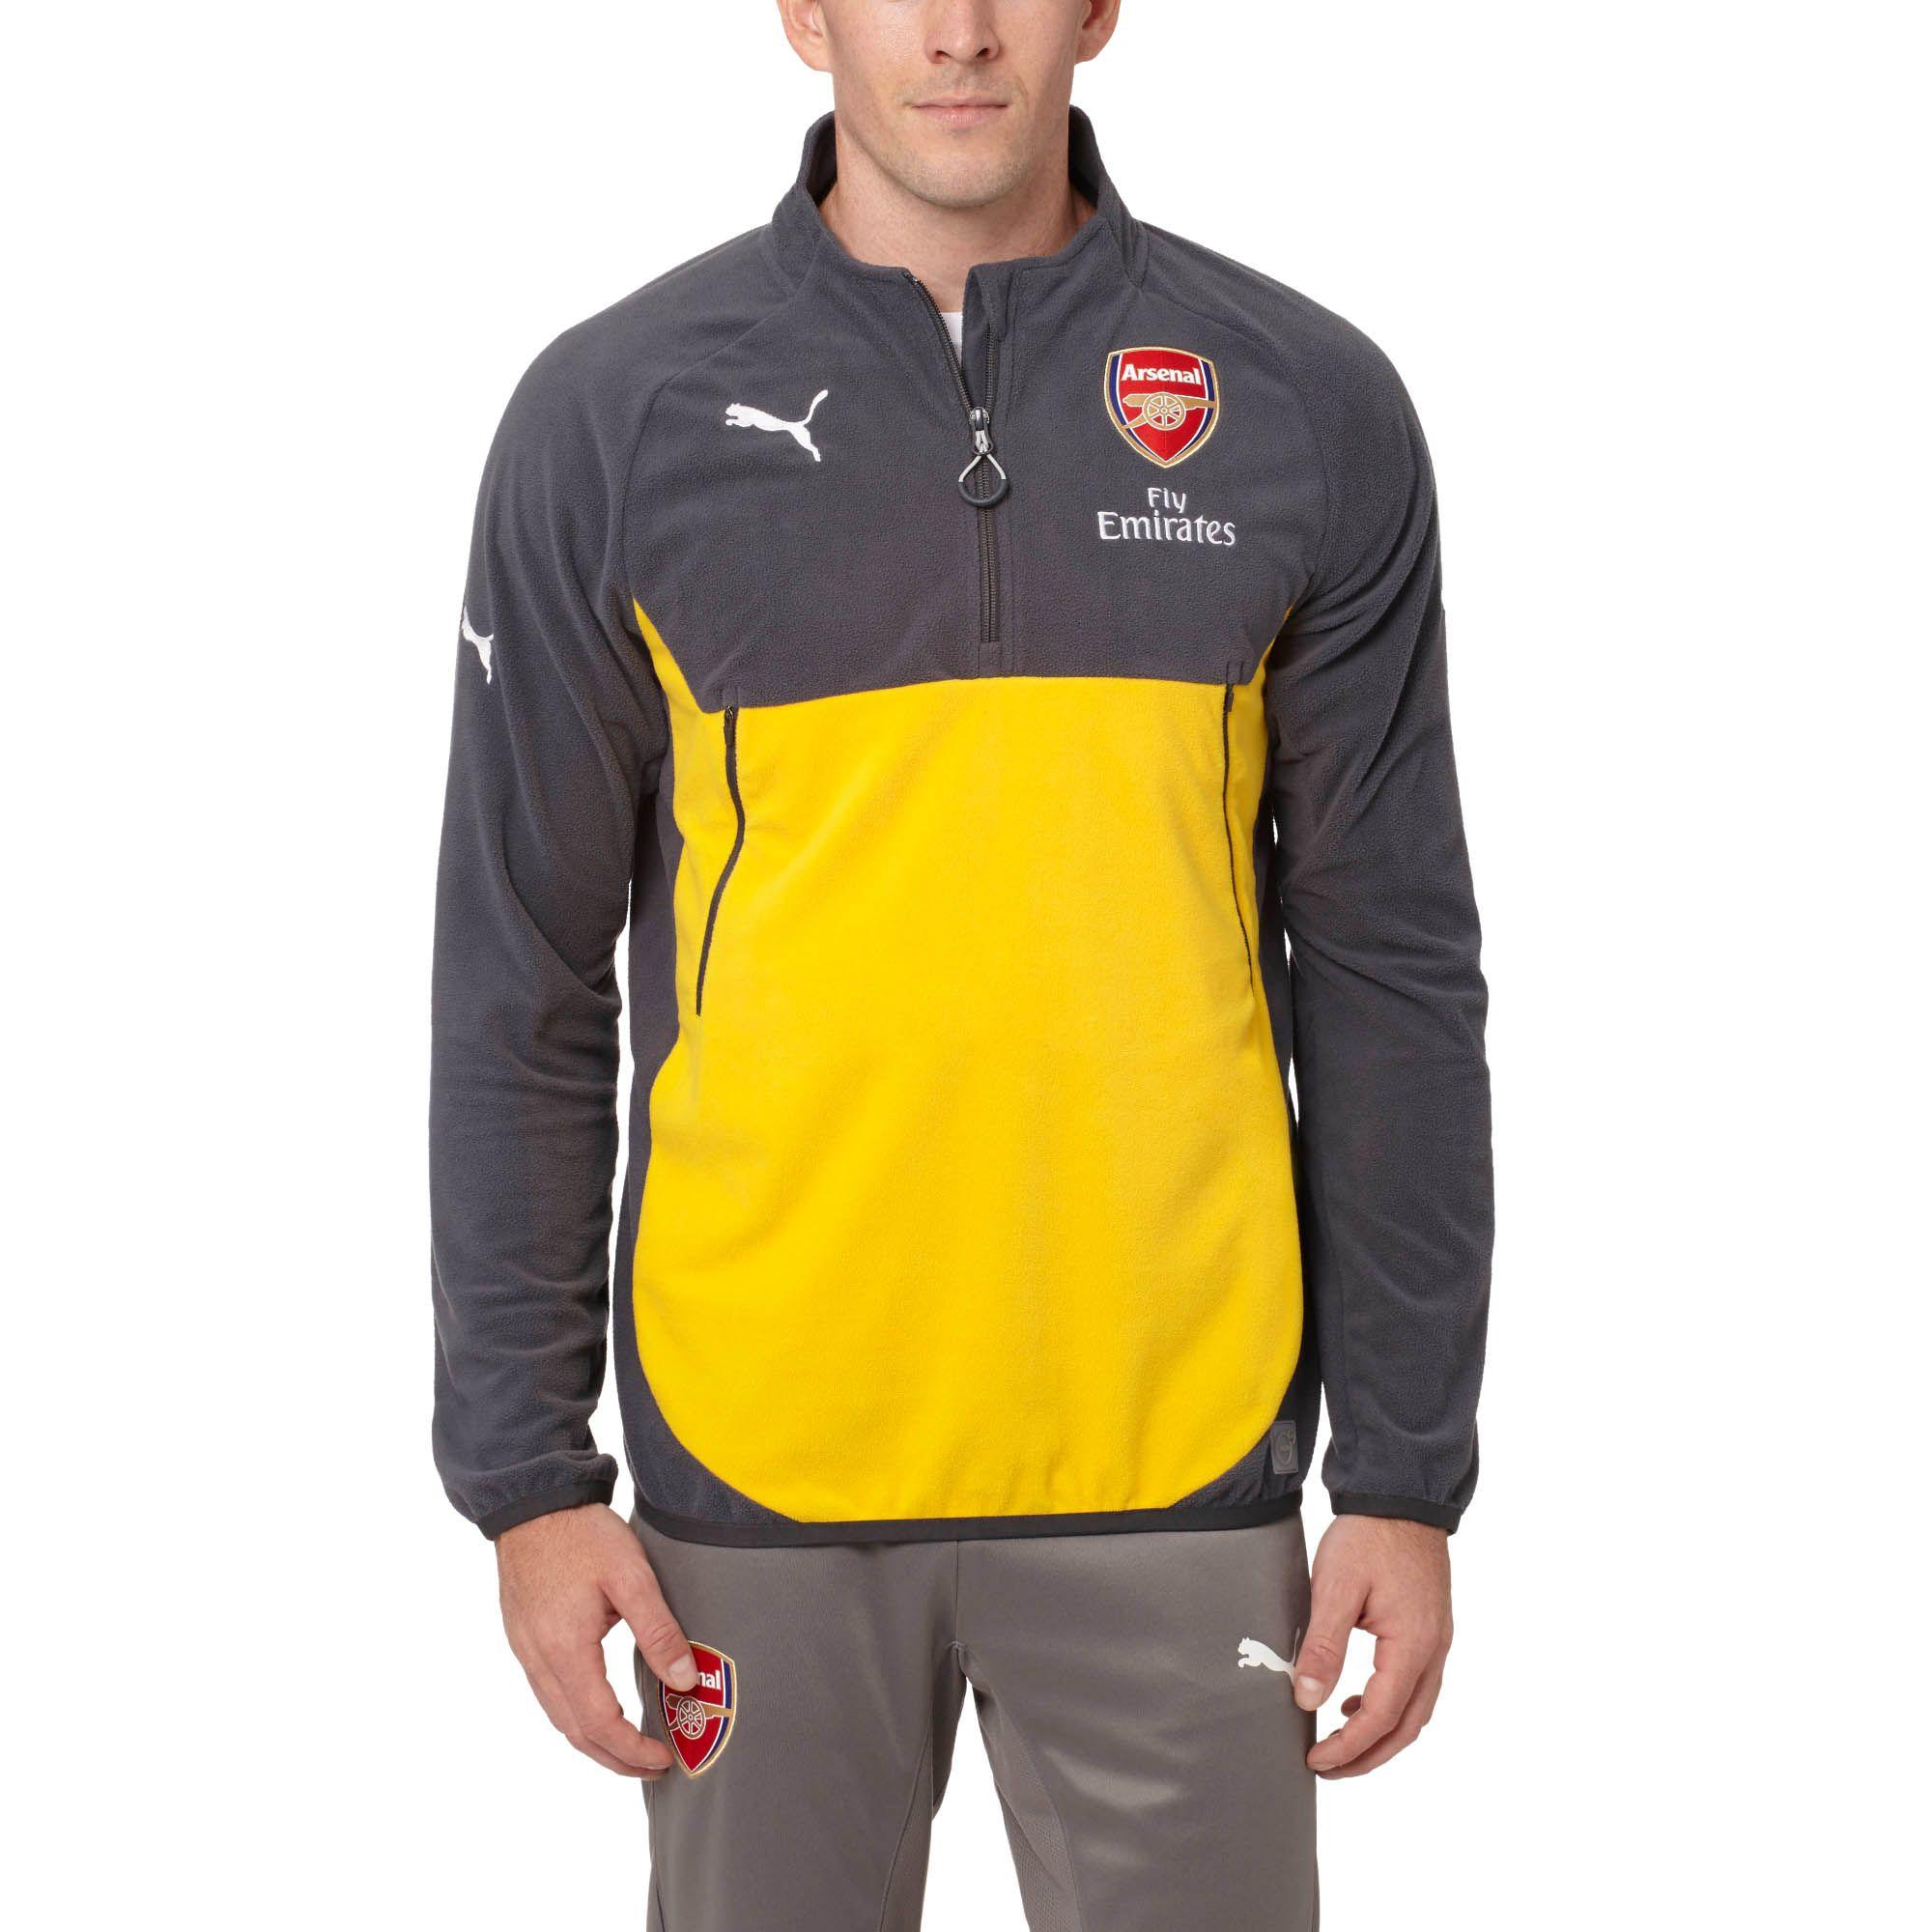 ... Lyst - Puma Arsenal Training Fleece in Blue for Men new york a36ed  e4bbd  Puma Arsenal 2016-2017 Away Jersey Spectra ... 927f3e78d